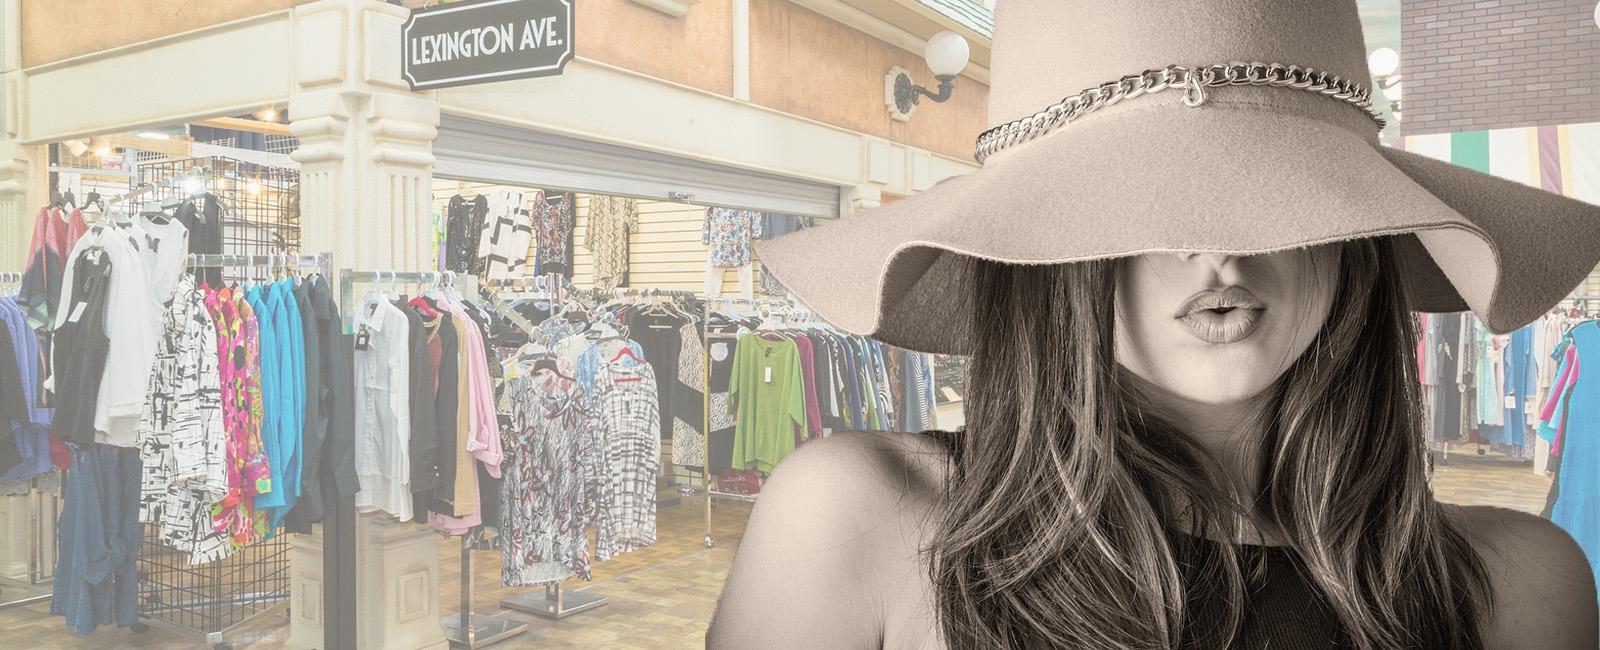 big apple shopping bazaar fashion accessories